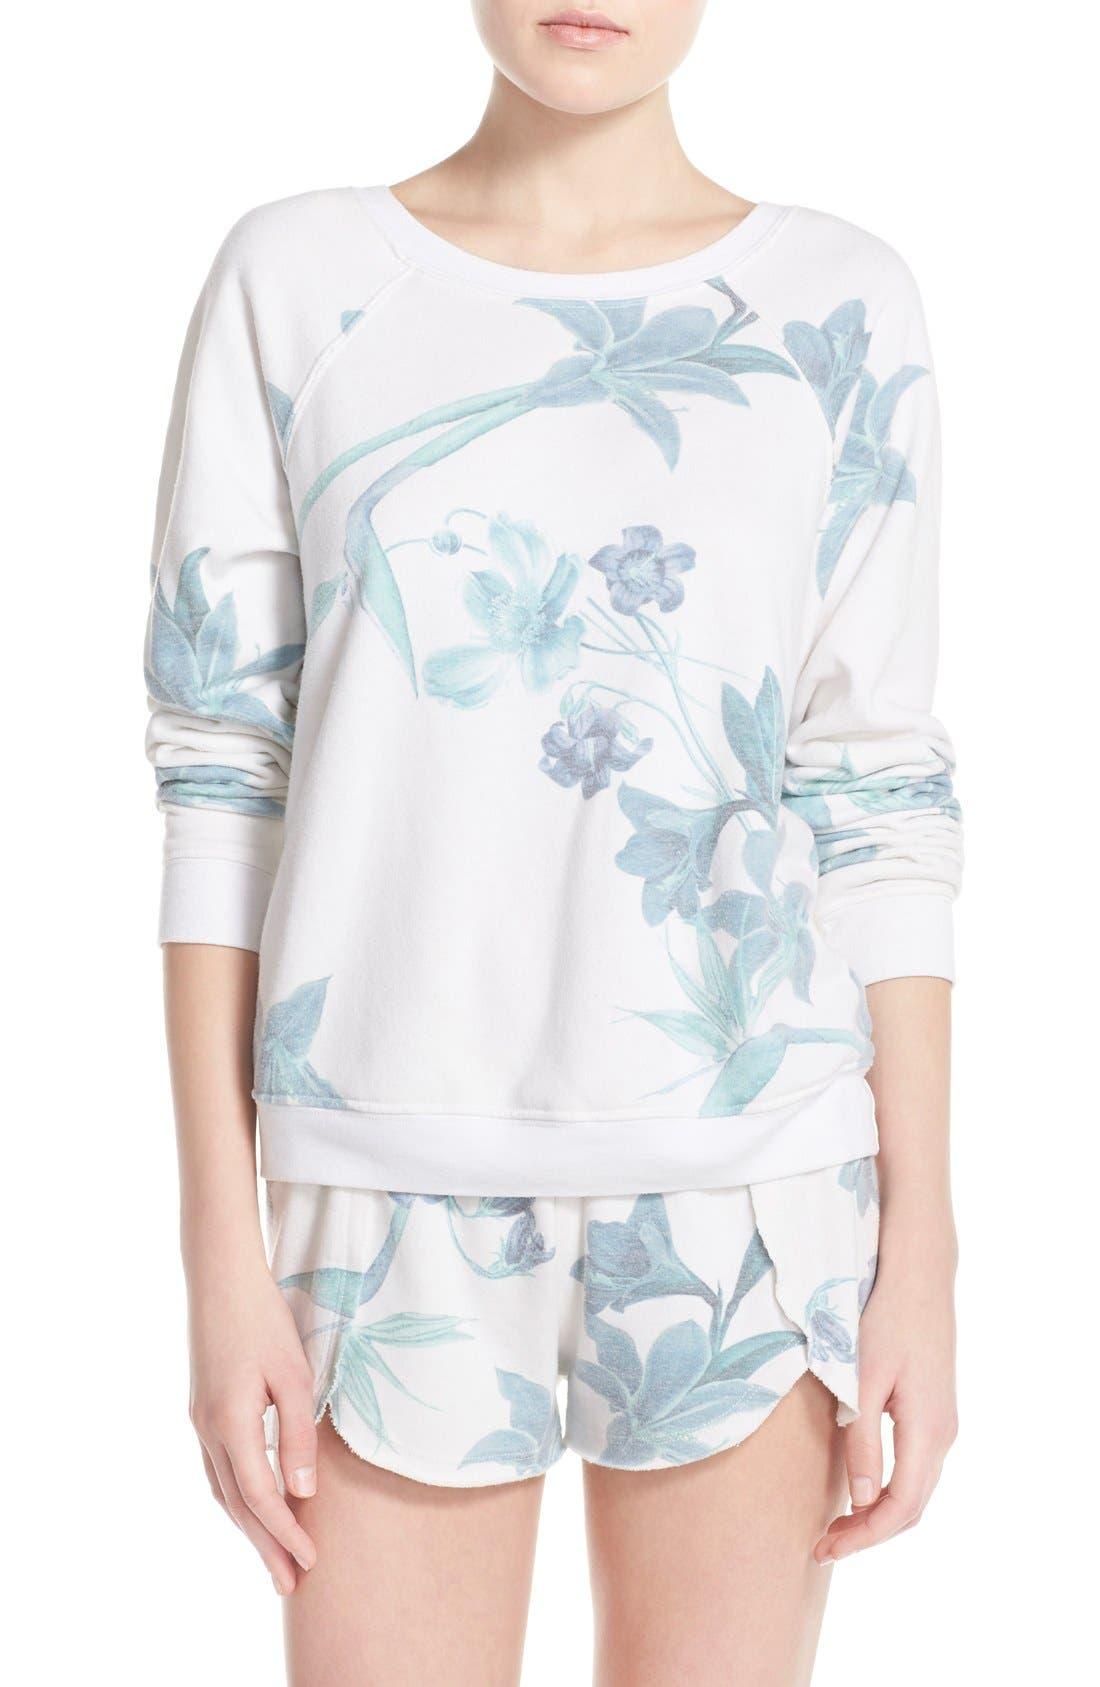 Main Image - 35mm 'Jenna' Floral Sweatshirt